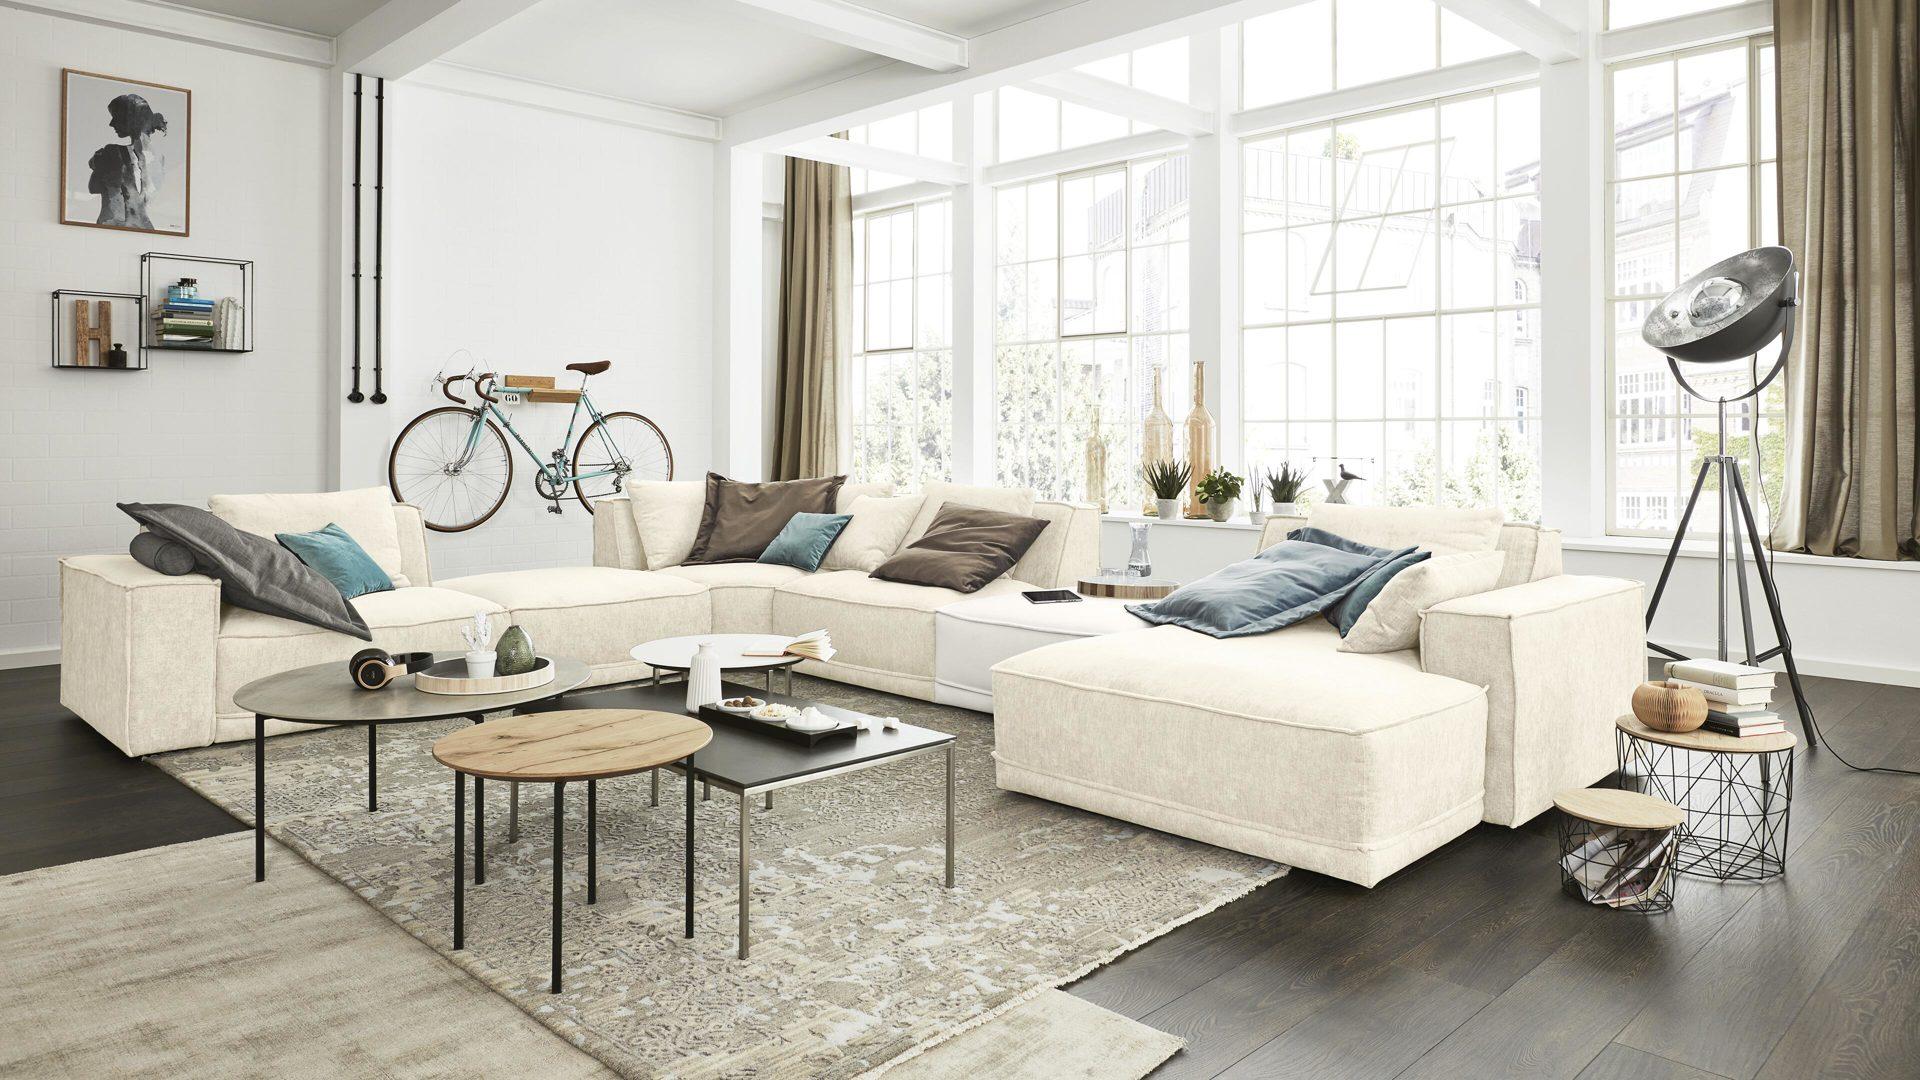 Interliving Sofa Serie 4100 Wohnlandschaft Cremefarbener Bezug